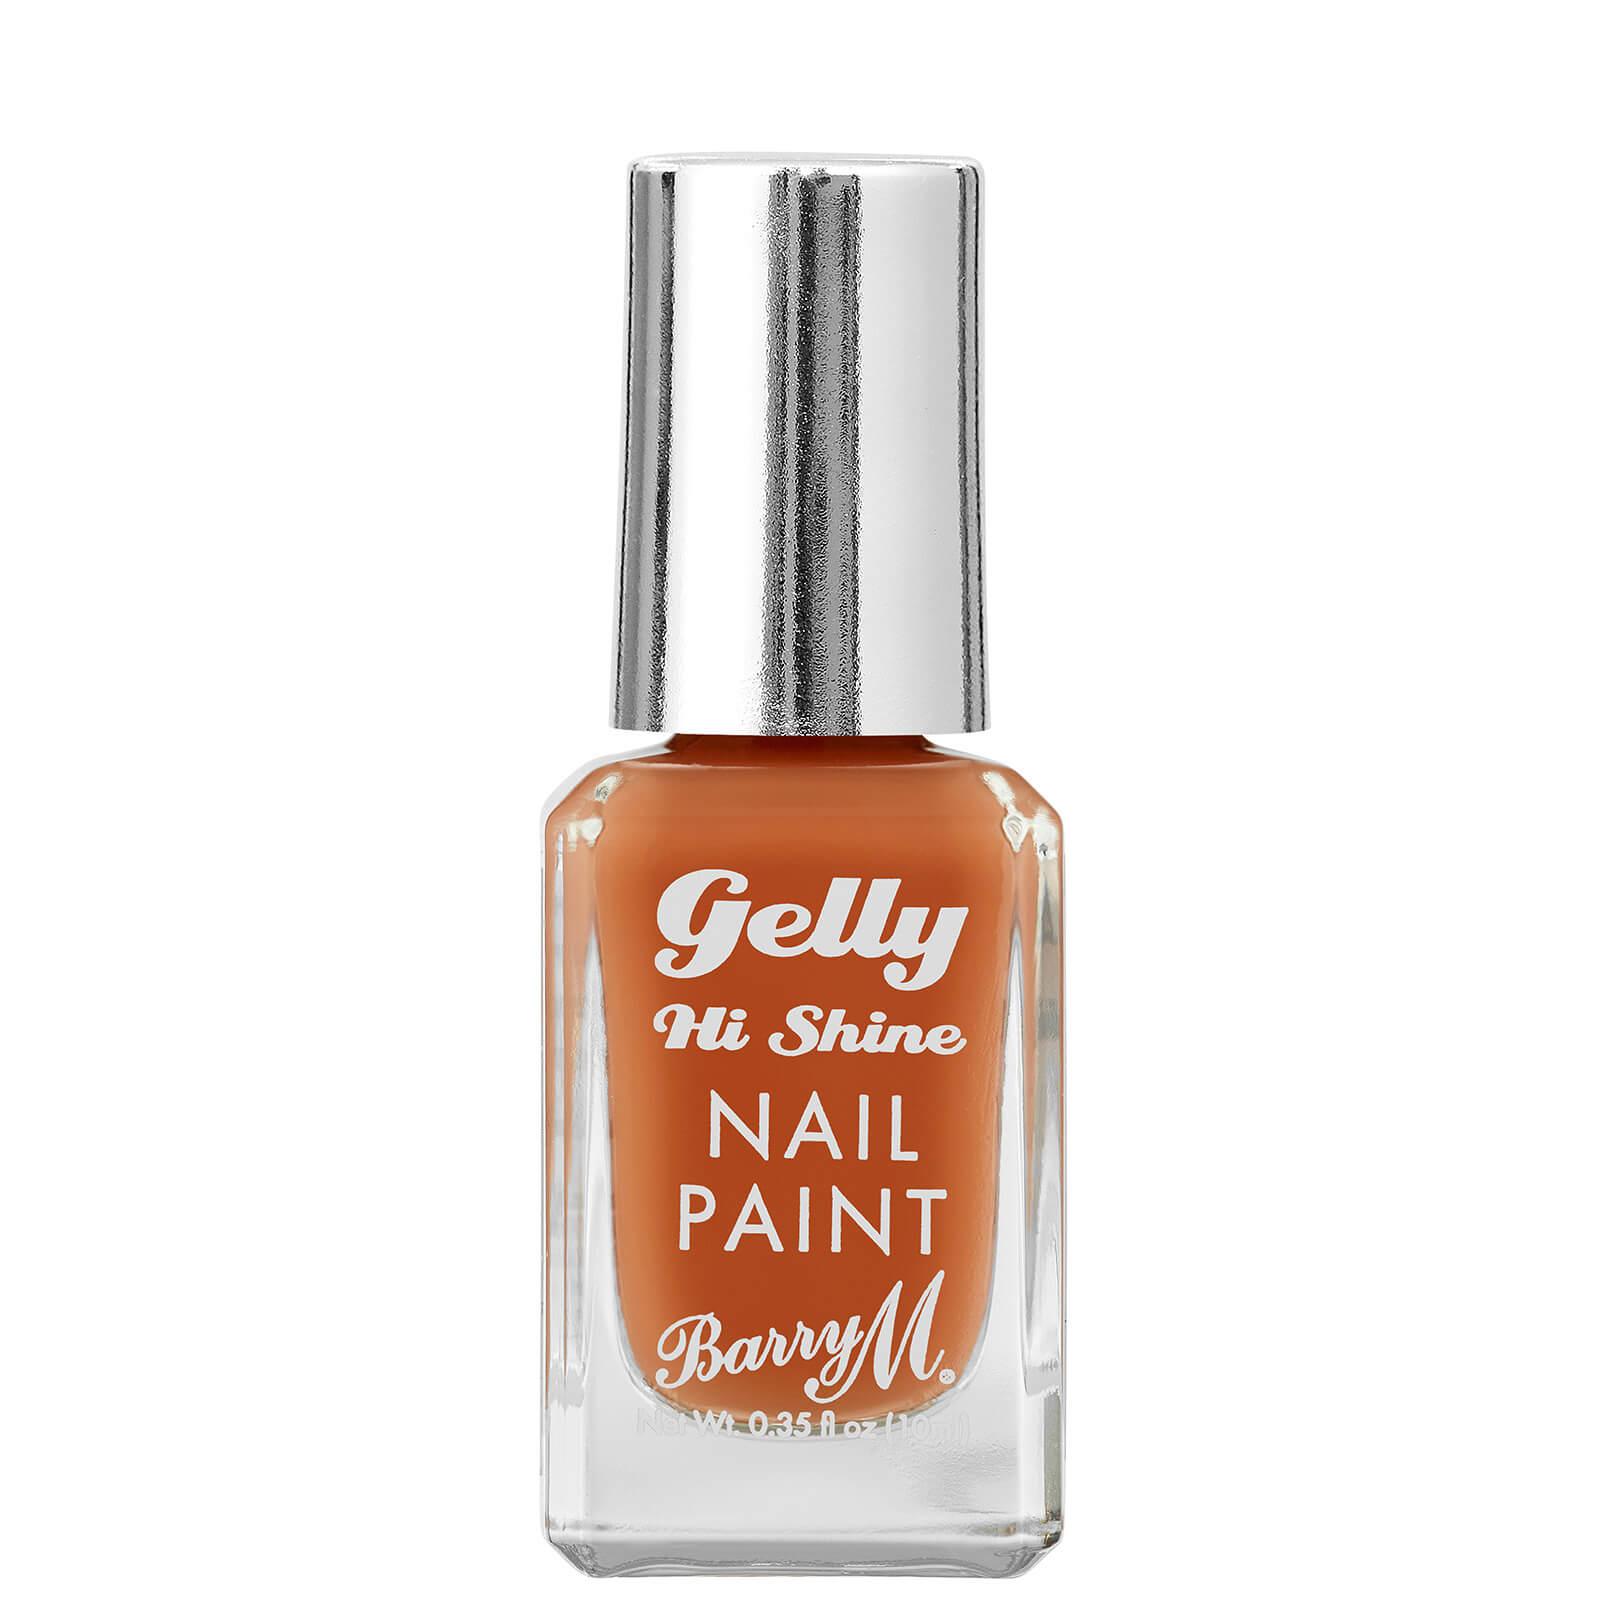 Купить Barry M Cosmetics Gelly Nail Paint 10ml (Various Shades) - Apricot Tart